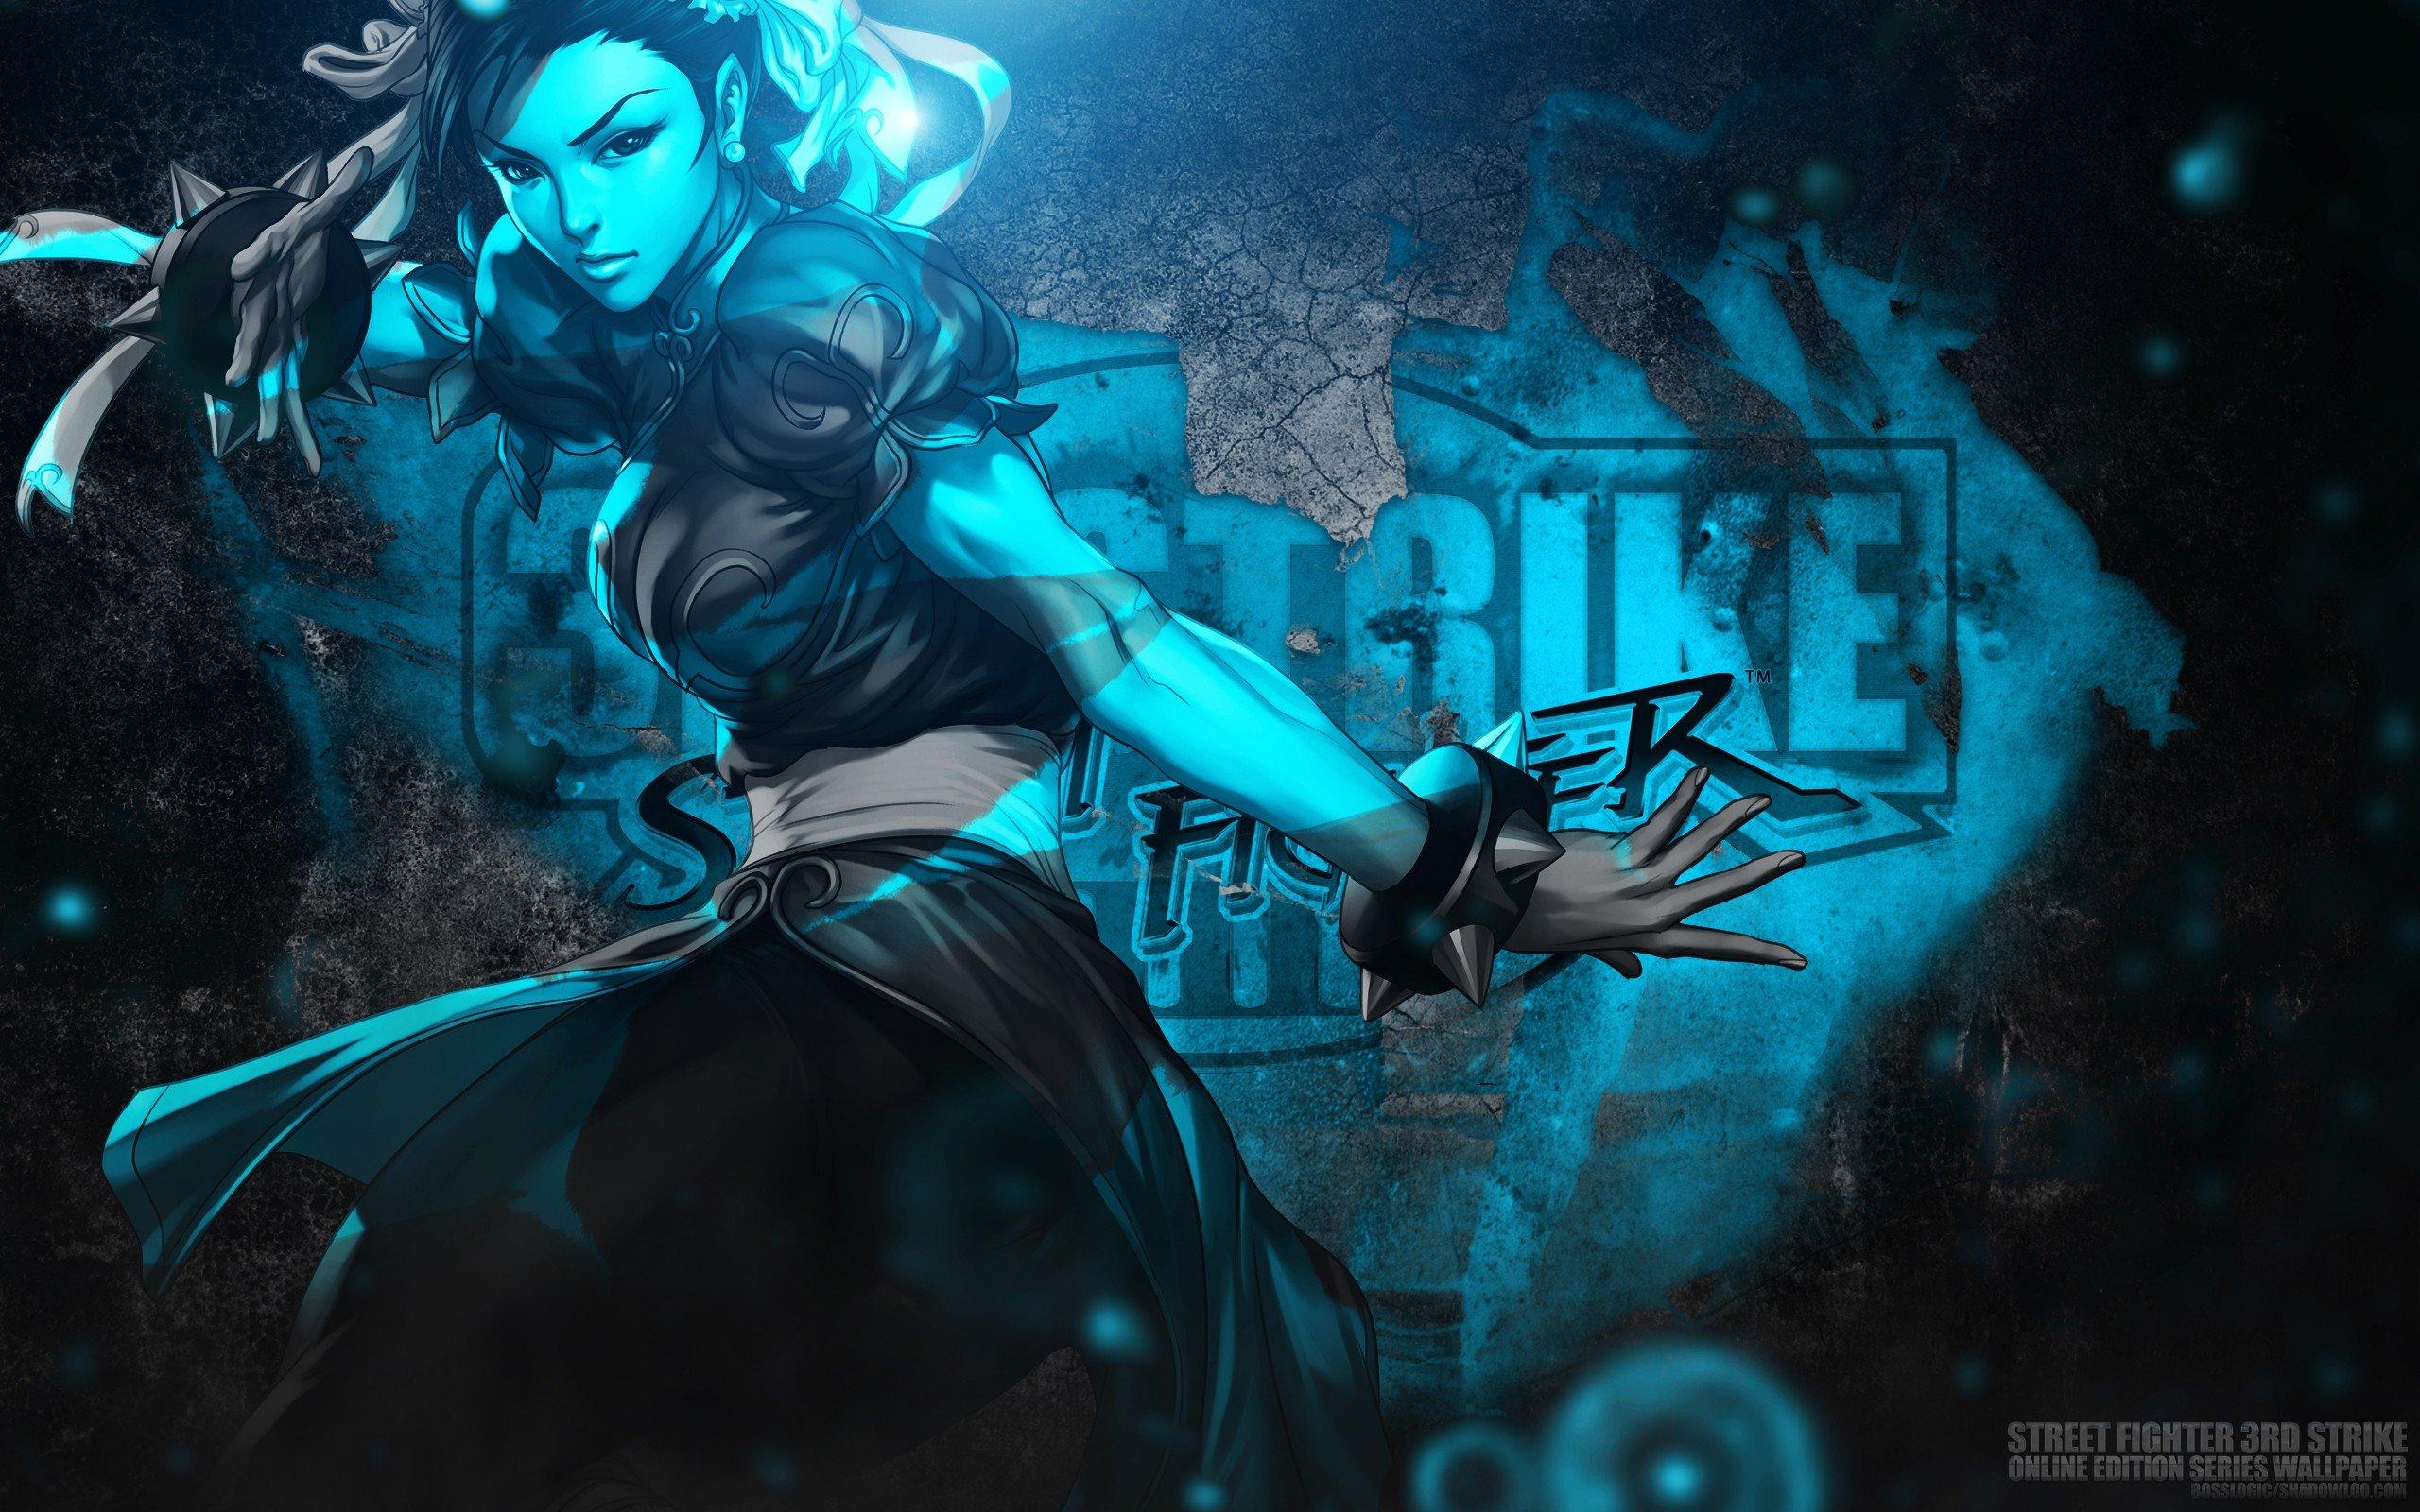 Chun Li Bosslogic Artgerm Street Fighter Iii 3rd Strike Online